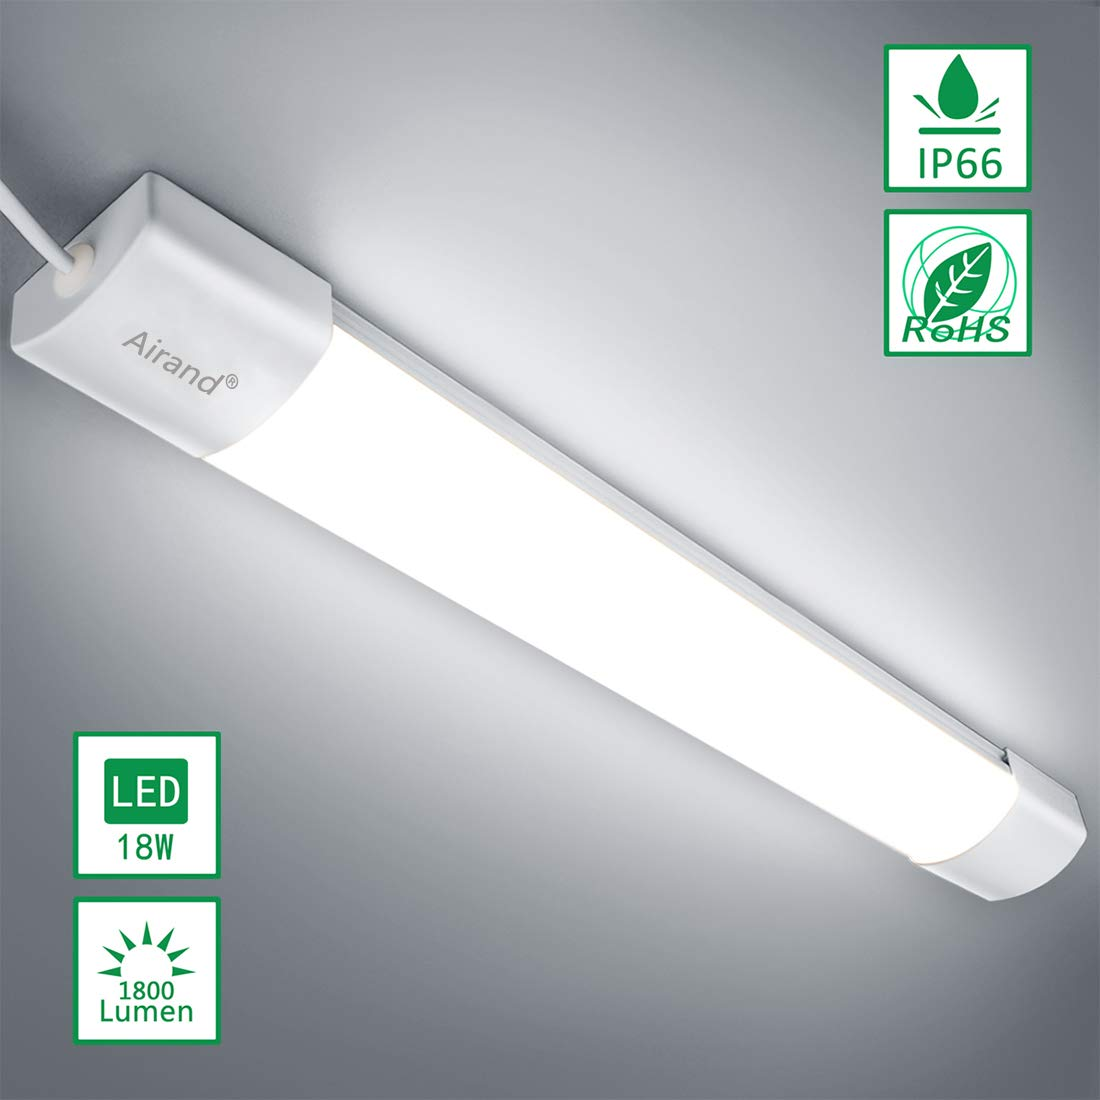 Airand 5000K Ceiling Lights LED Flushmount Shop Light for Garage Lighting Fixture 18W 2FT LED Wraparound Light LED Ceiling Lamp for Kitchen, Bathroom, Cabinet, Basement, LED Office Lights